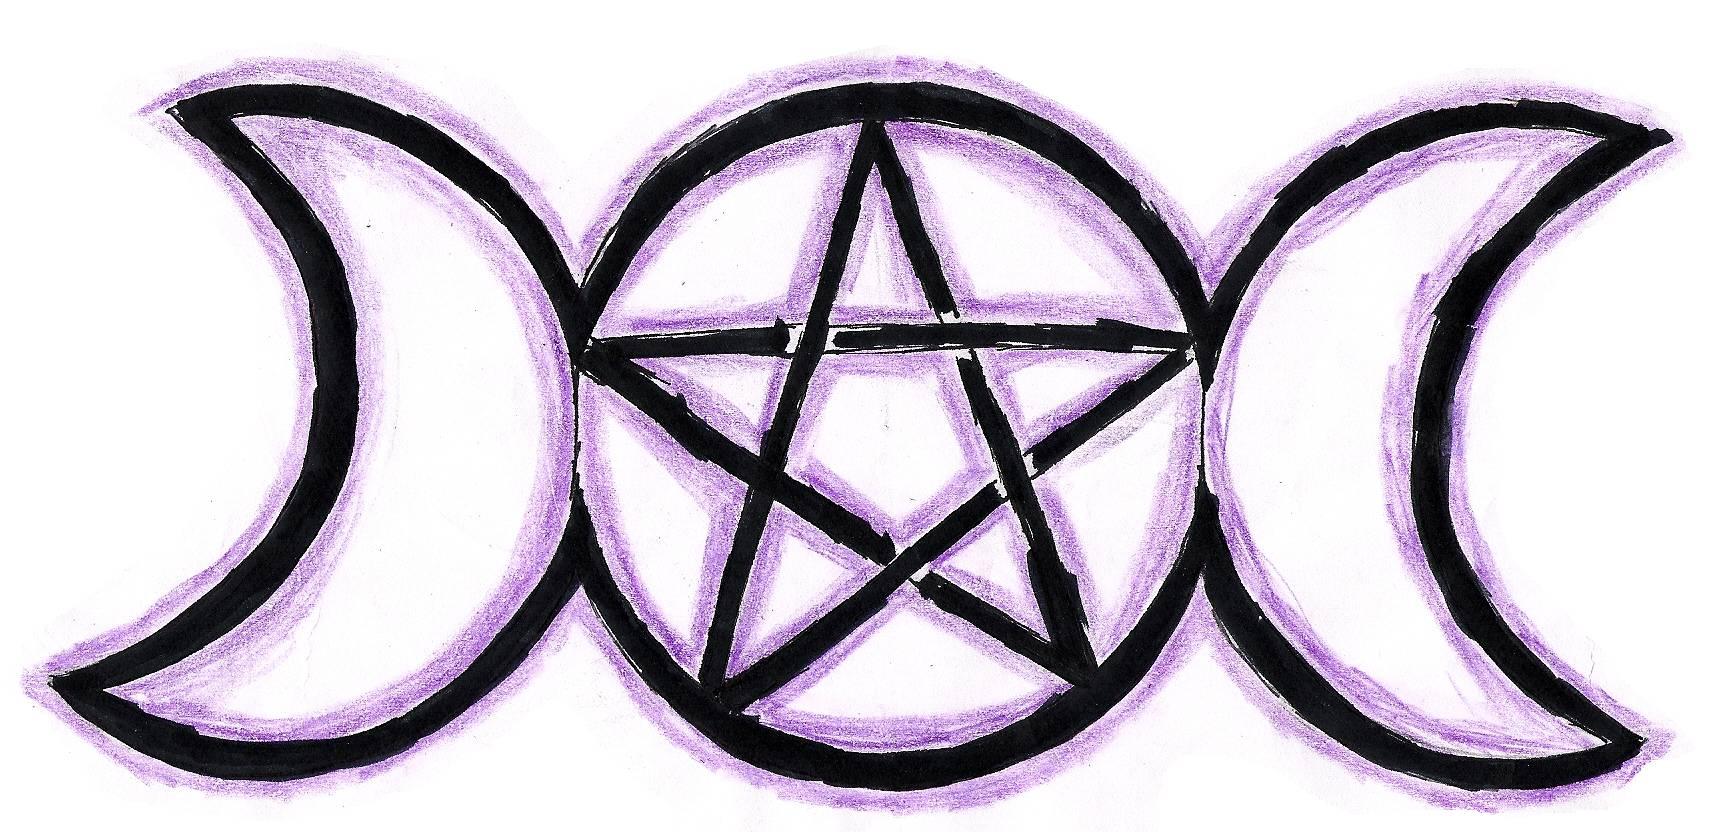 Wiccan Pentagram Goddesses pentagram by 1710x832